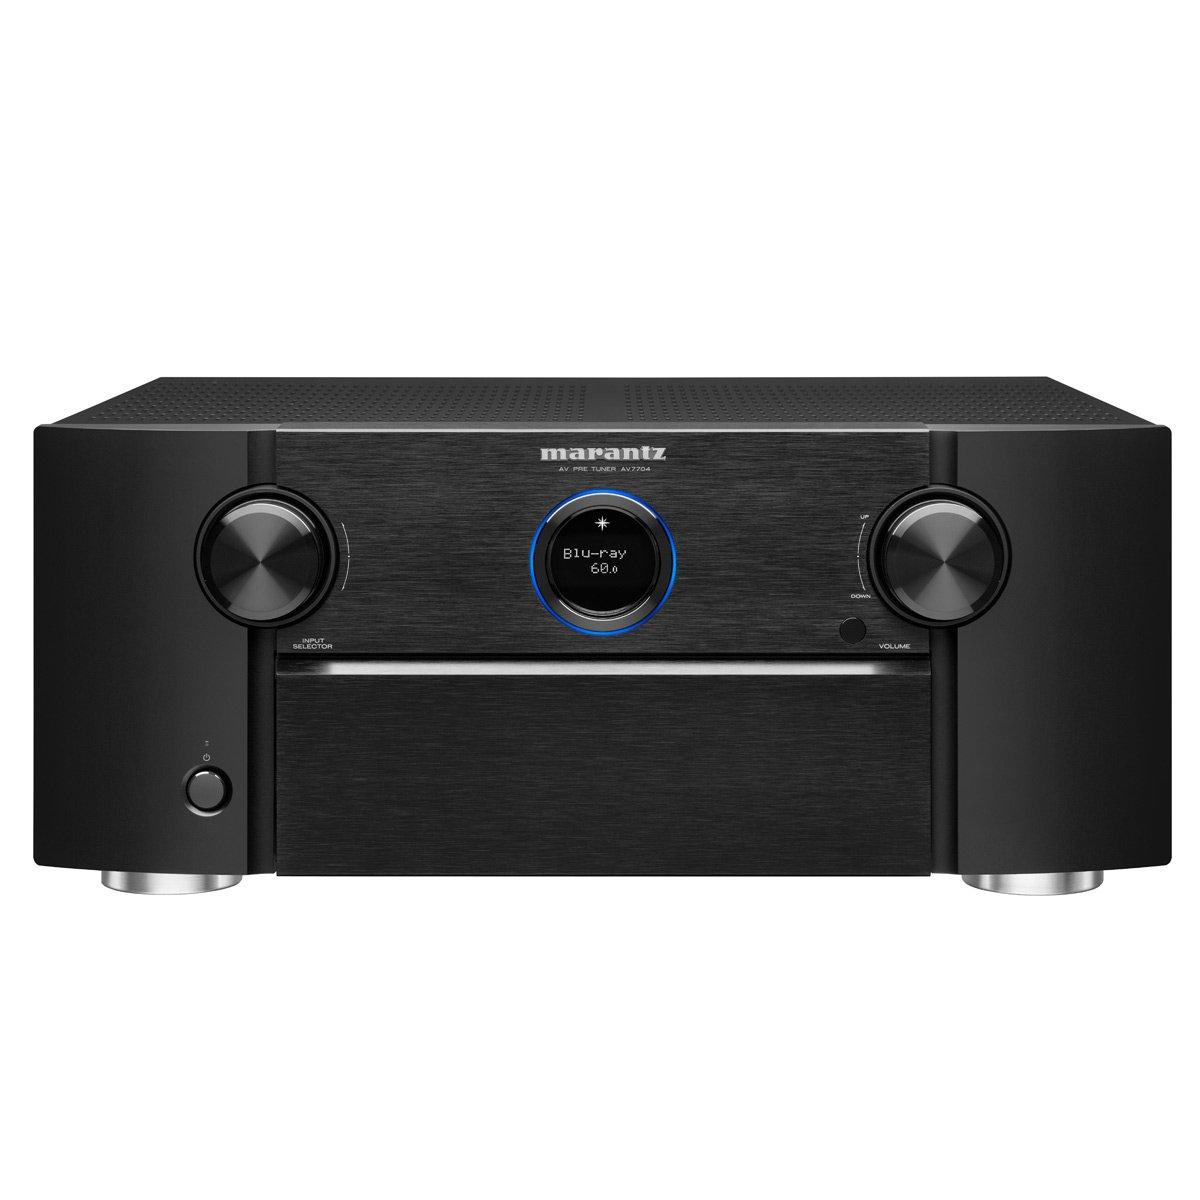 Marantz Pre-Amplifier Audio Component Amplifier Black (AV7704) by Marantz